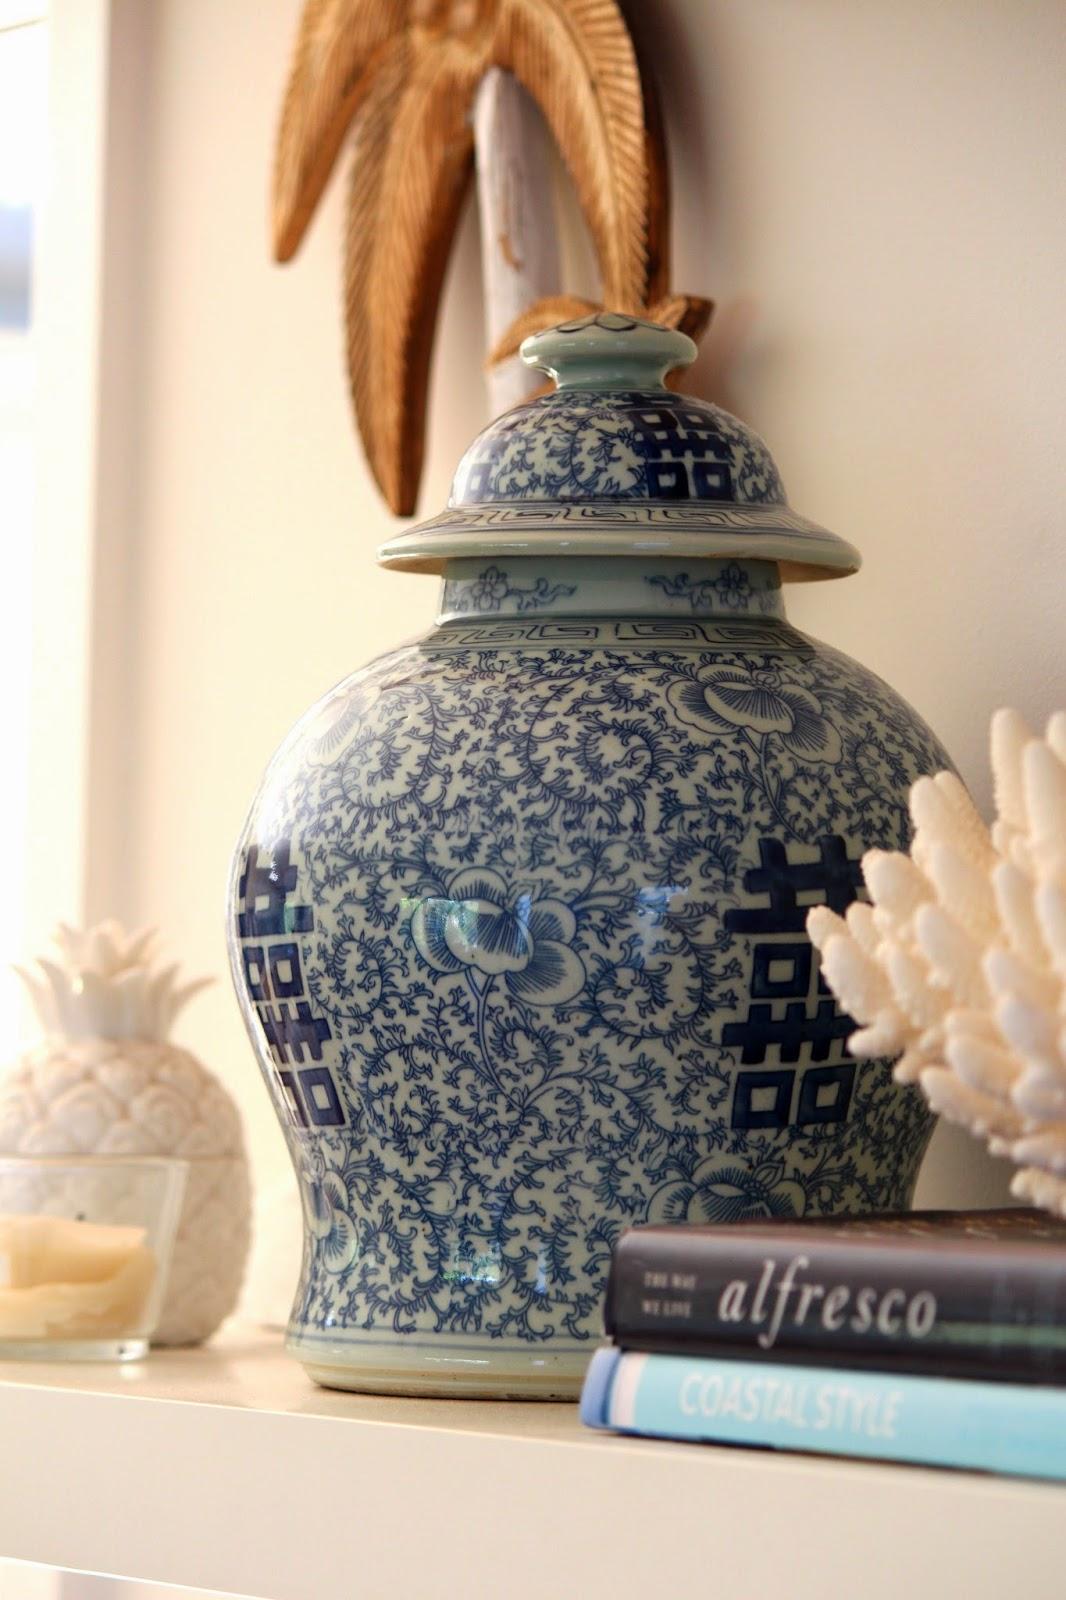 Coastal styling and craft ideas desire empire - Hamptons Style Shelving Ideas